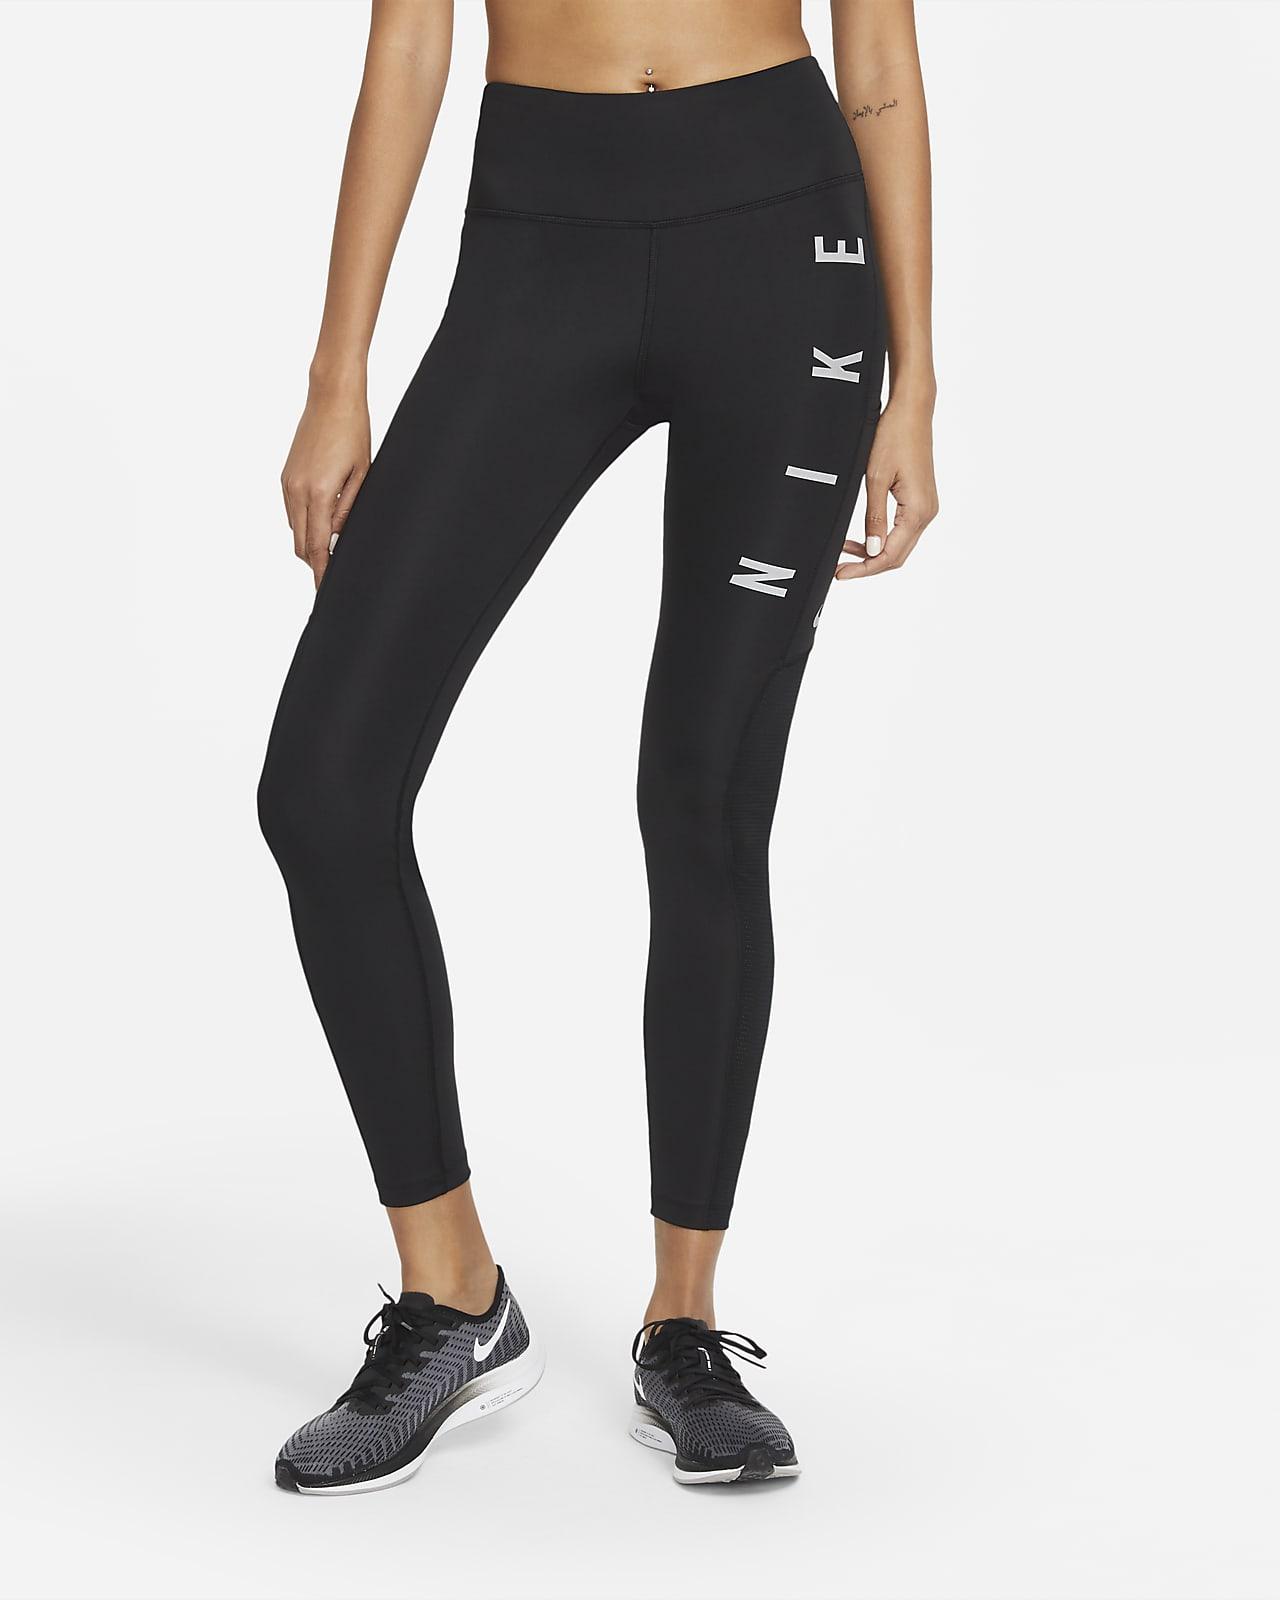 Nike Epic Fast Run Division Lauftights für Damen